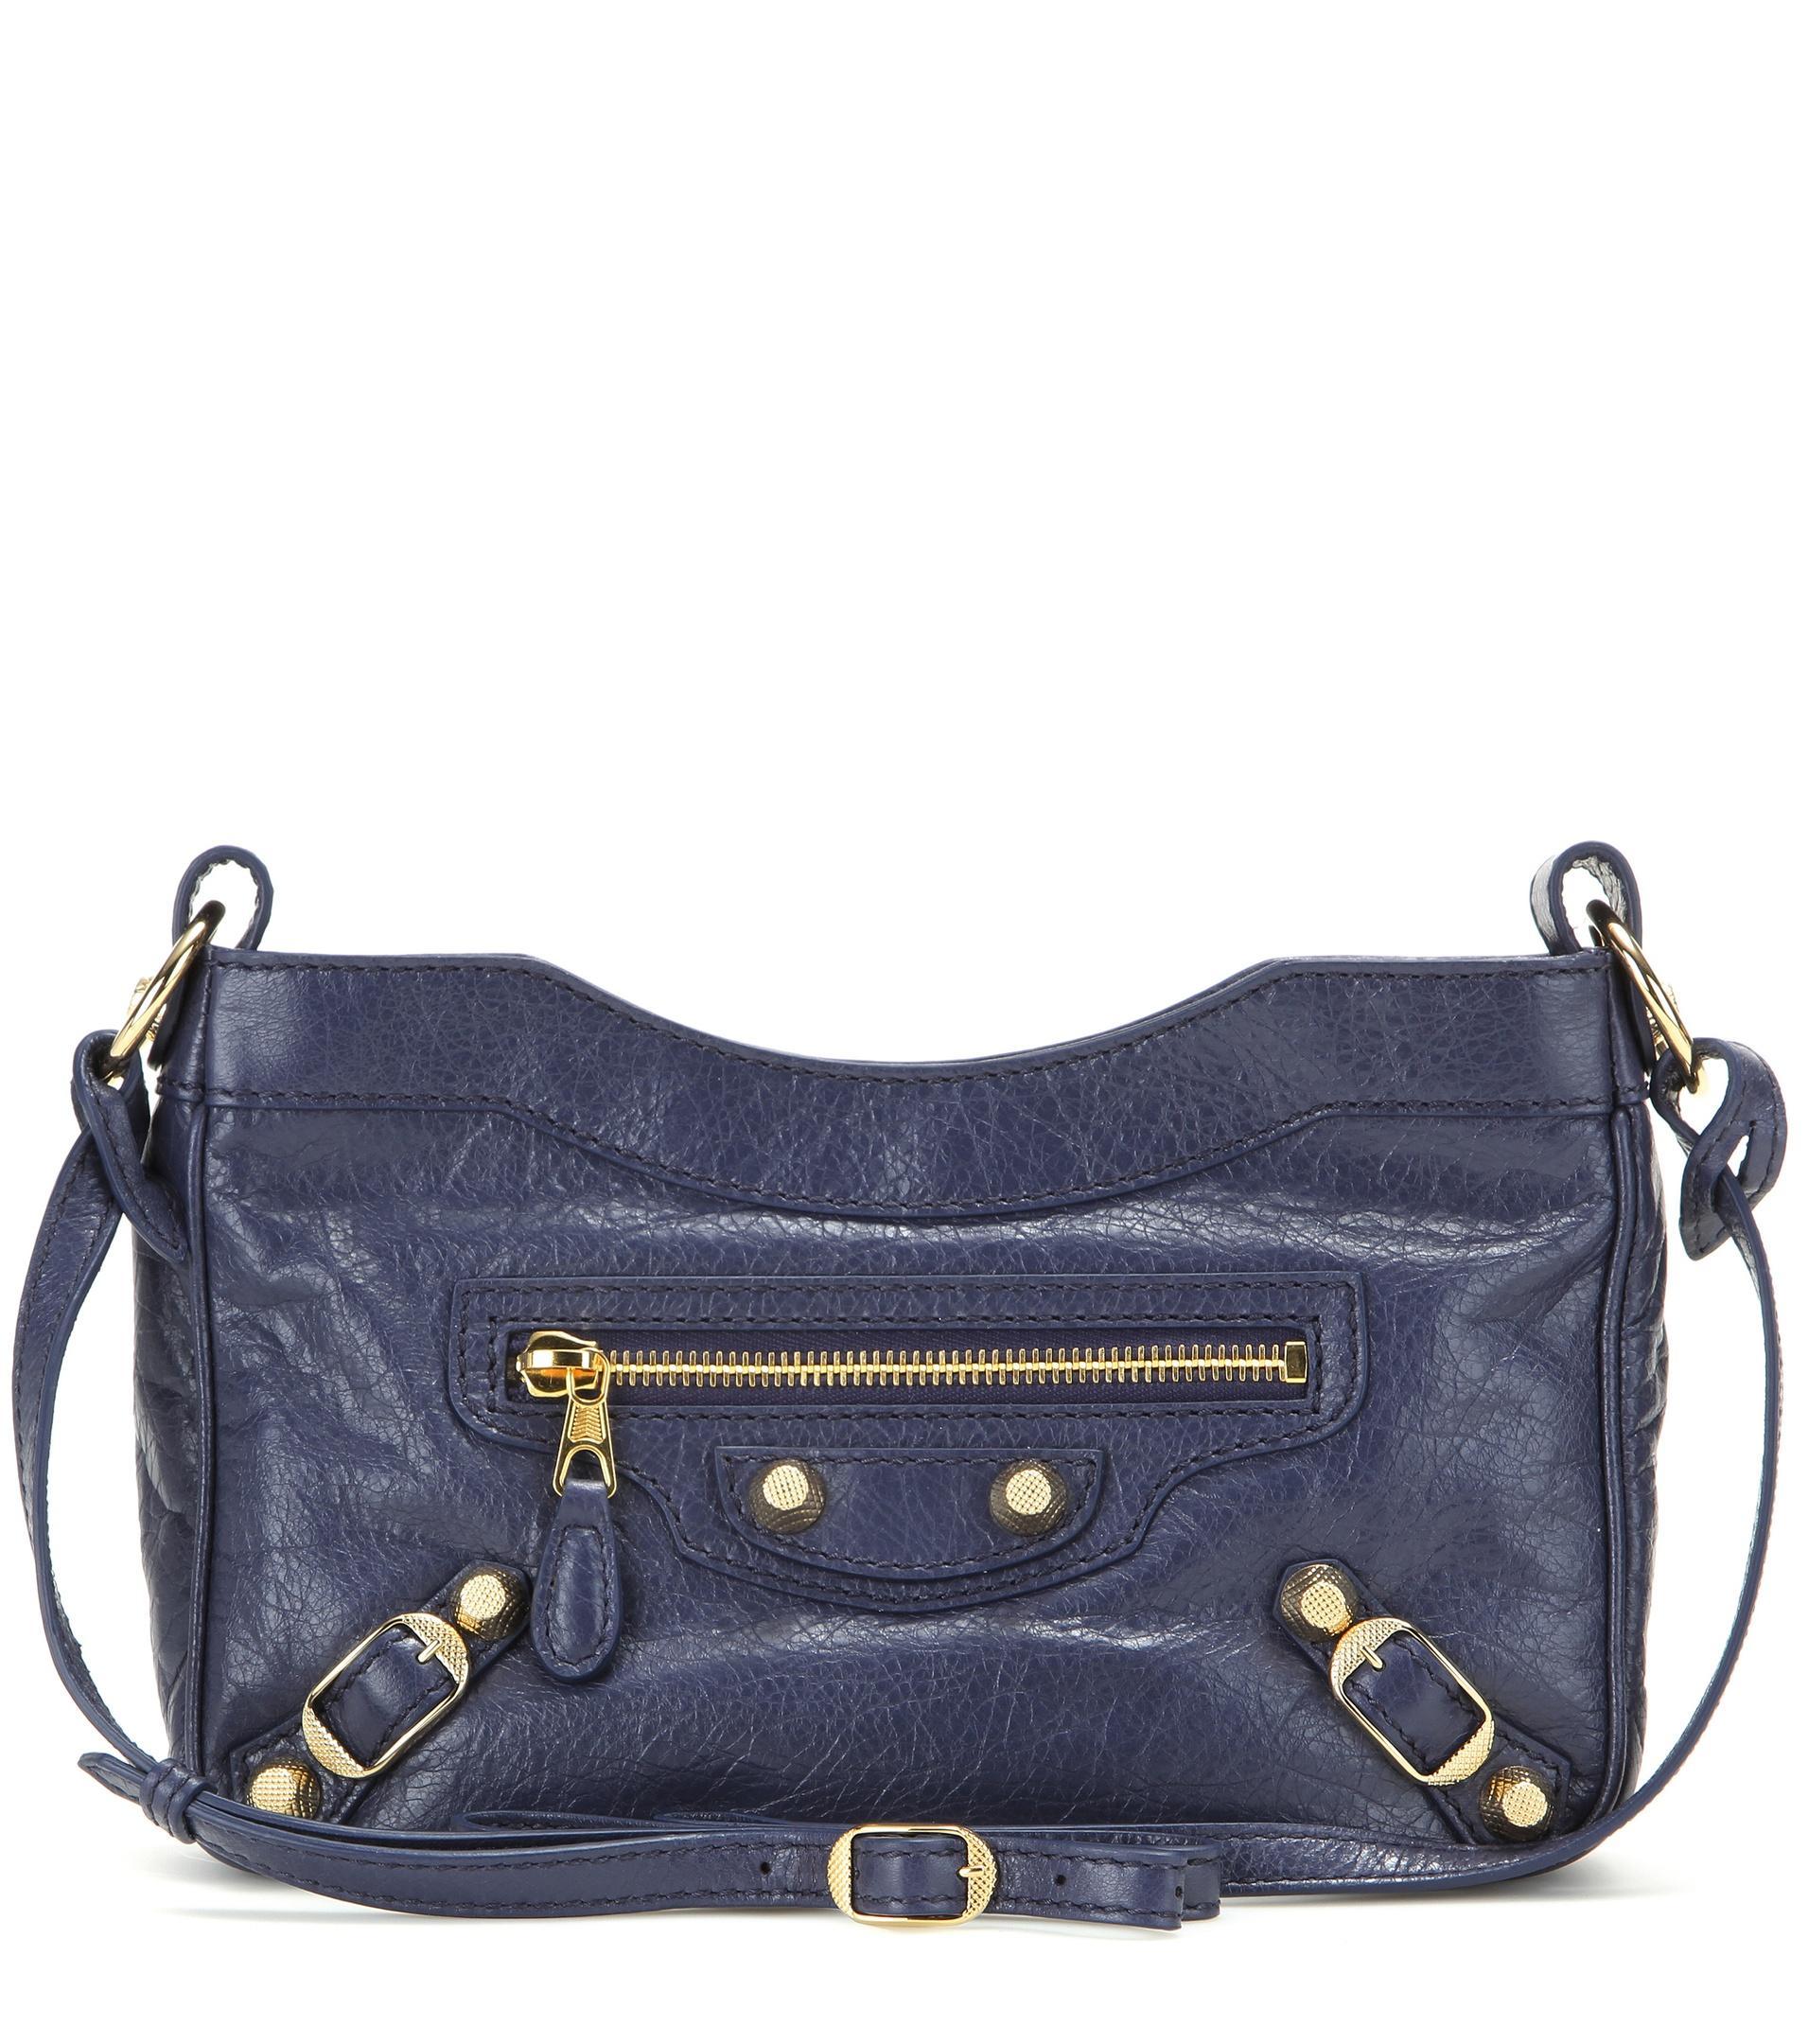 c9cb866514 Balenciaga Giant 12 Hip Leather Shoulder Bag in Black - Lyst